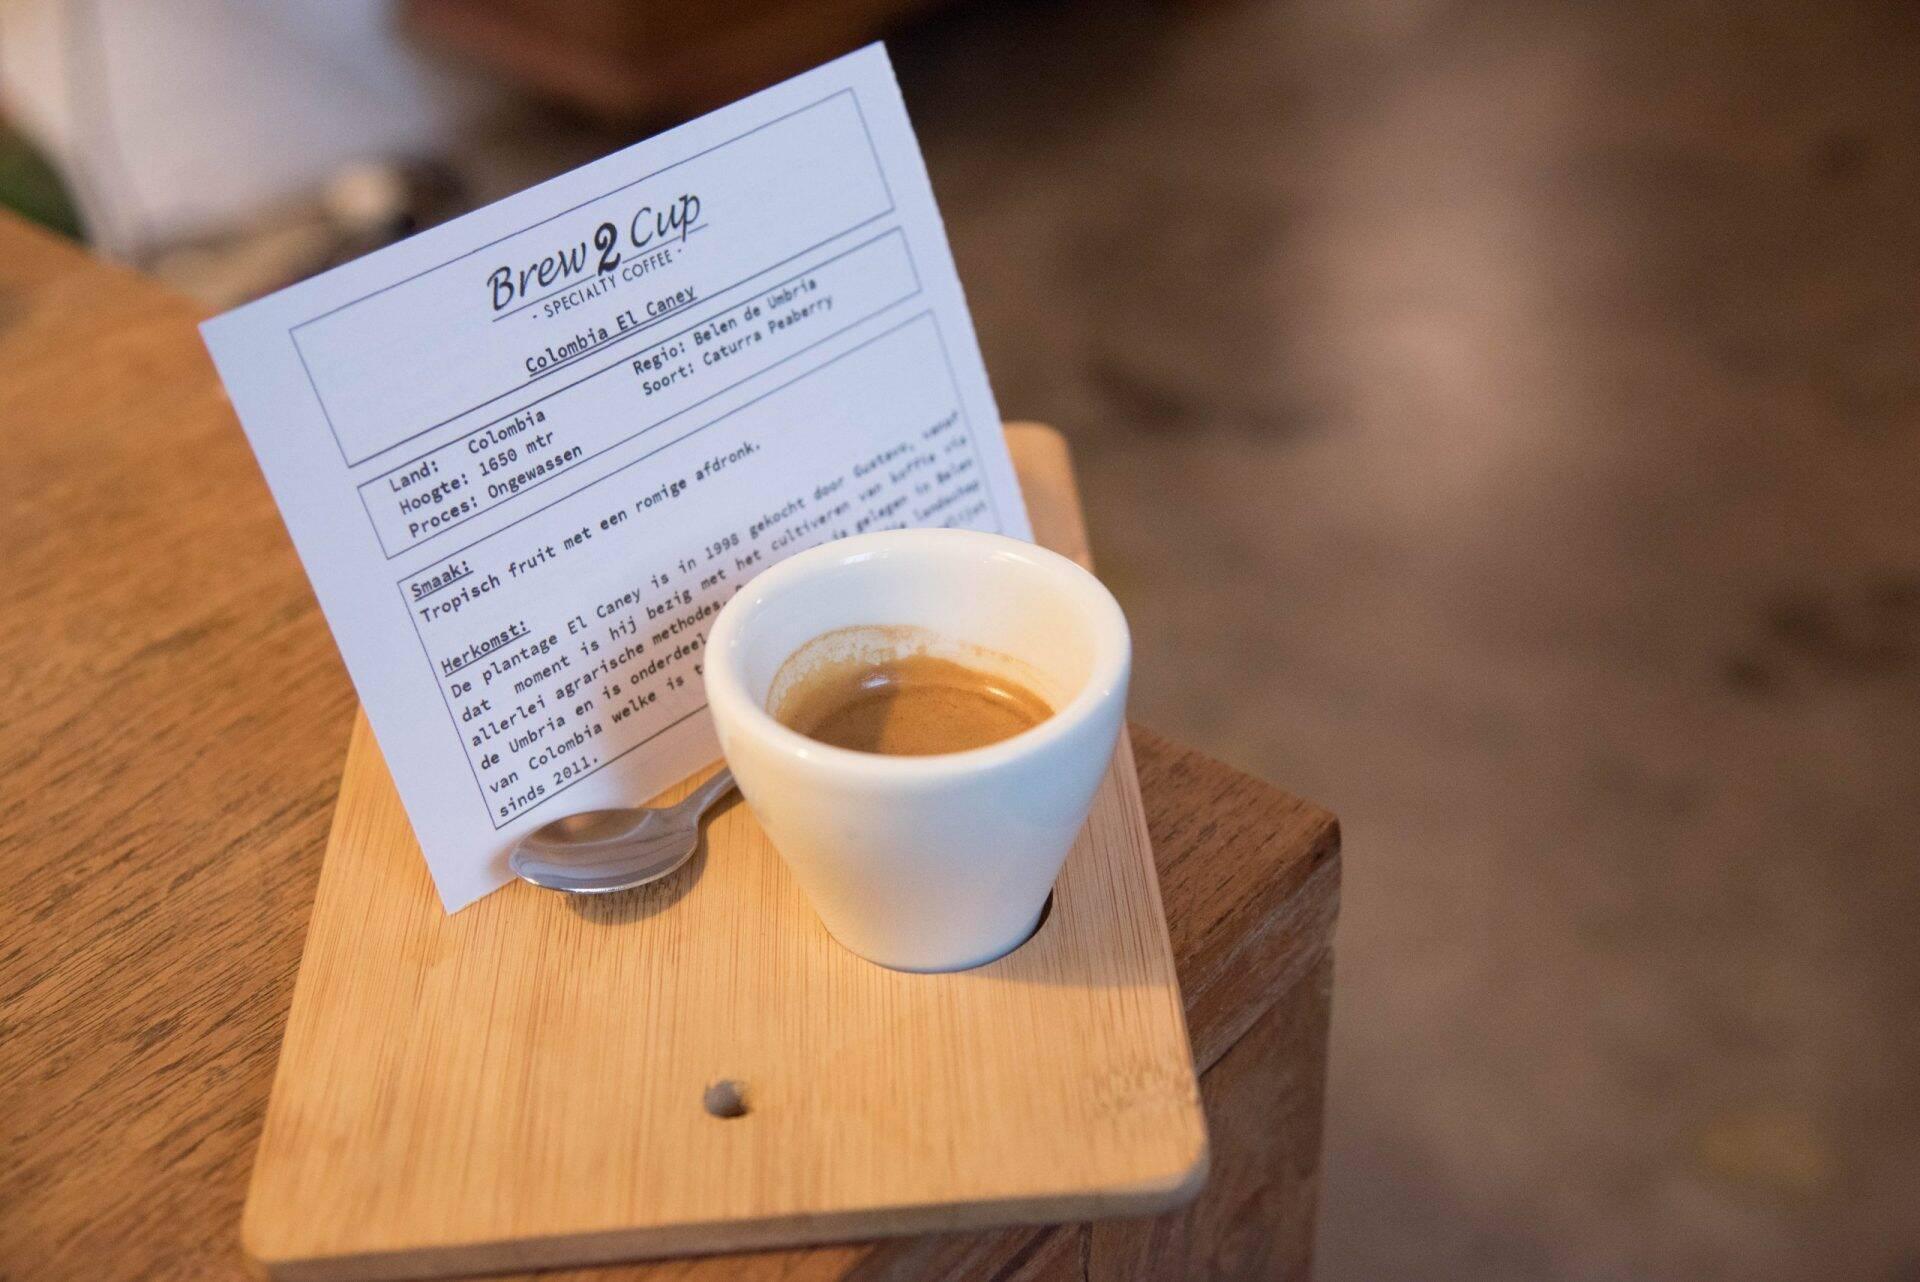 Koffiebar Arnhem - Brew2cup